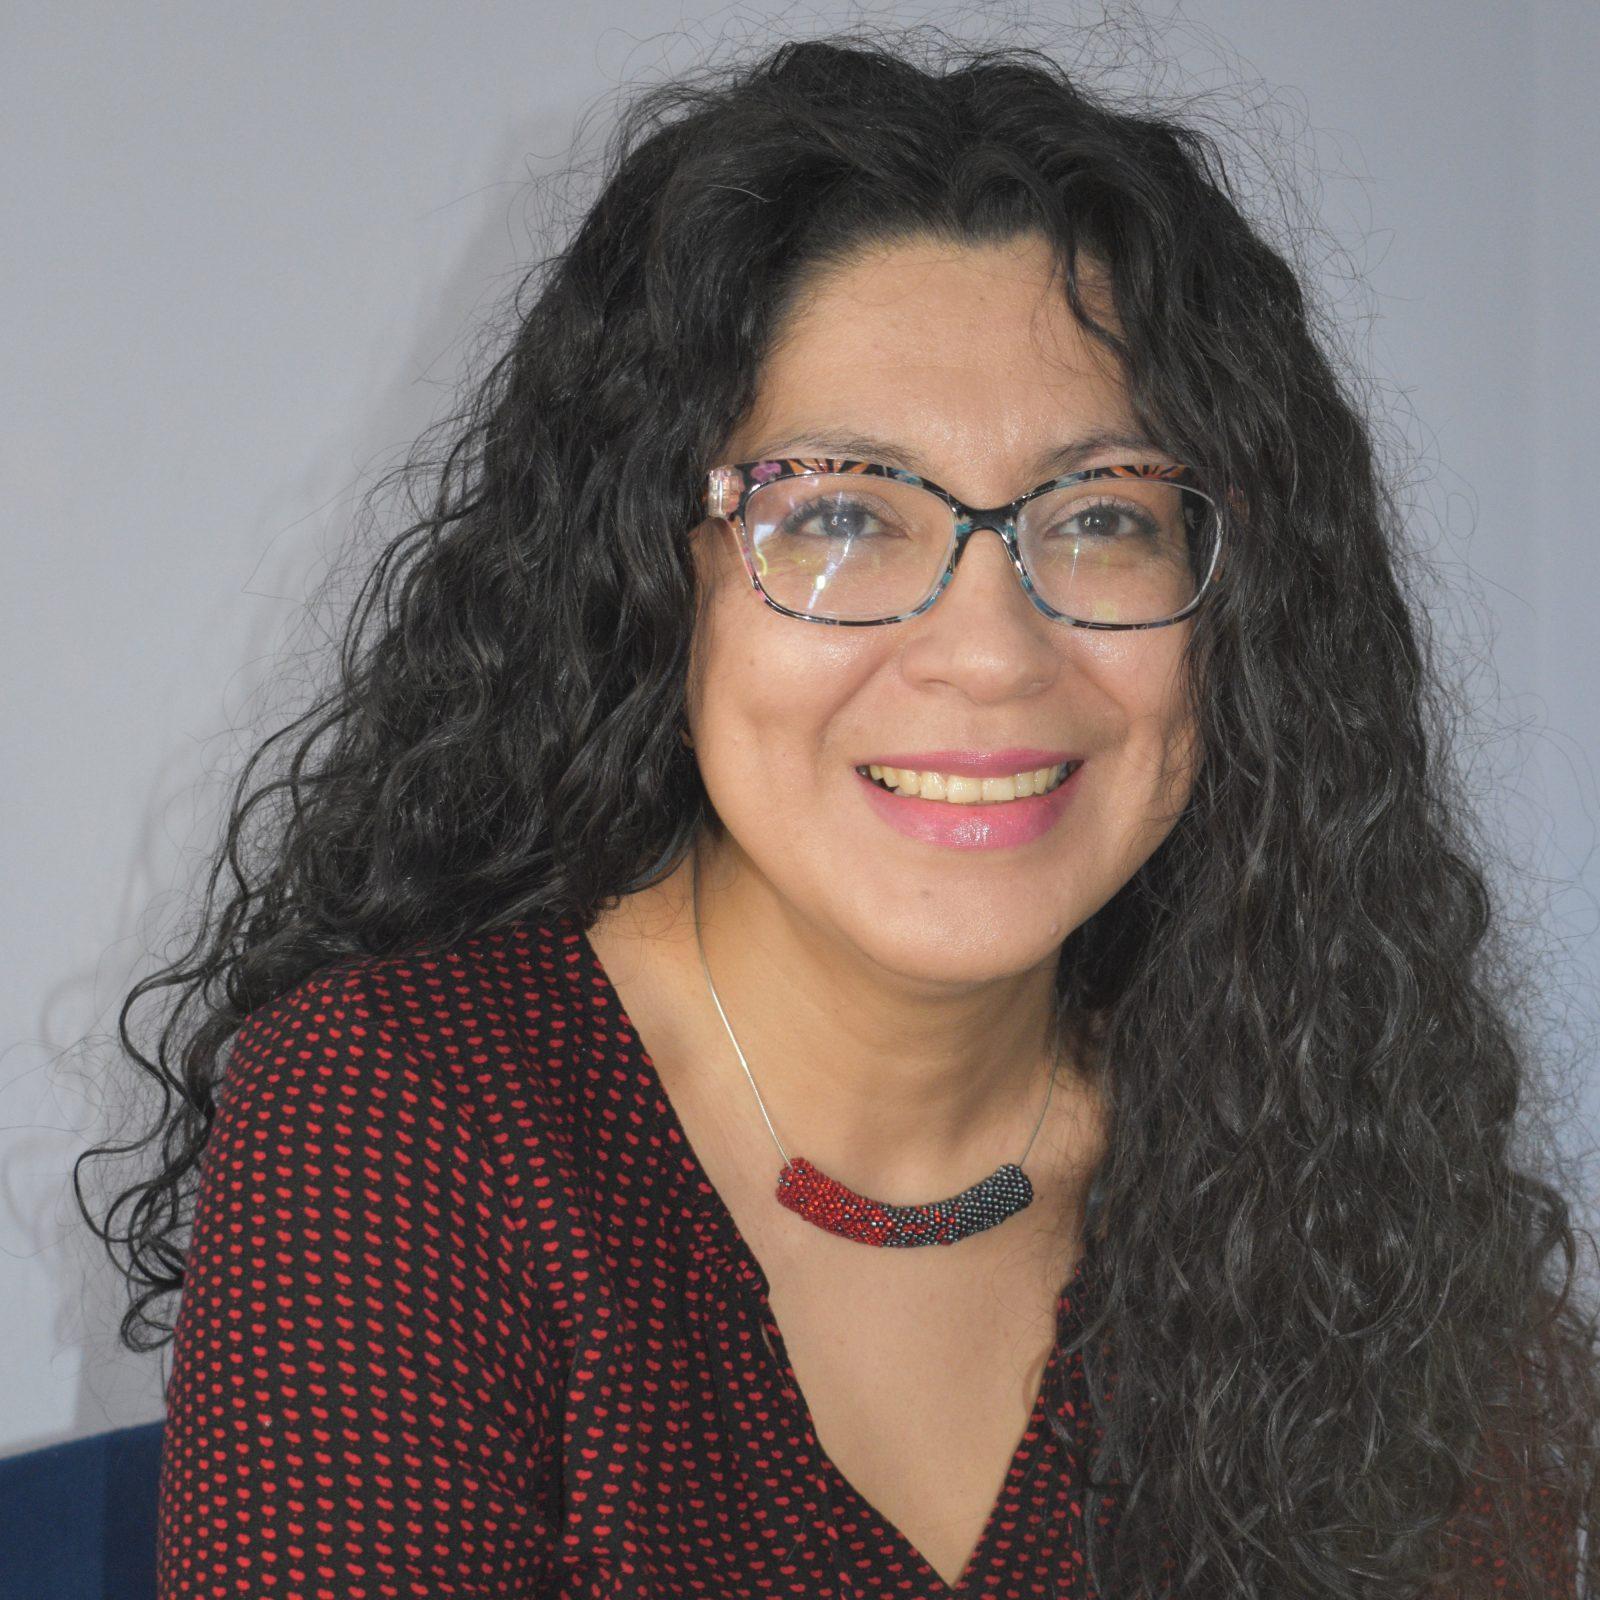 Adriana Alarcón